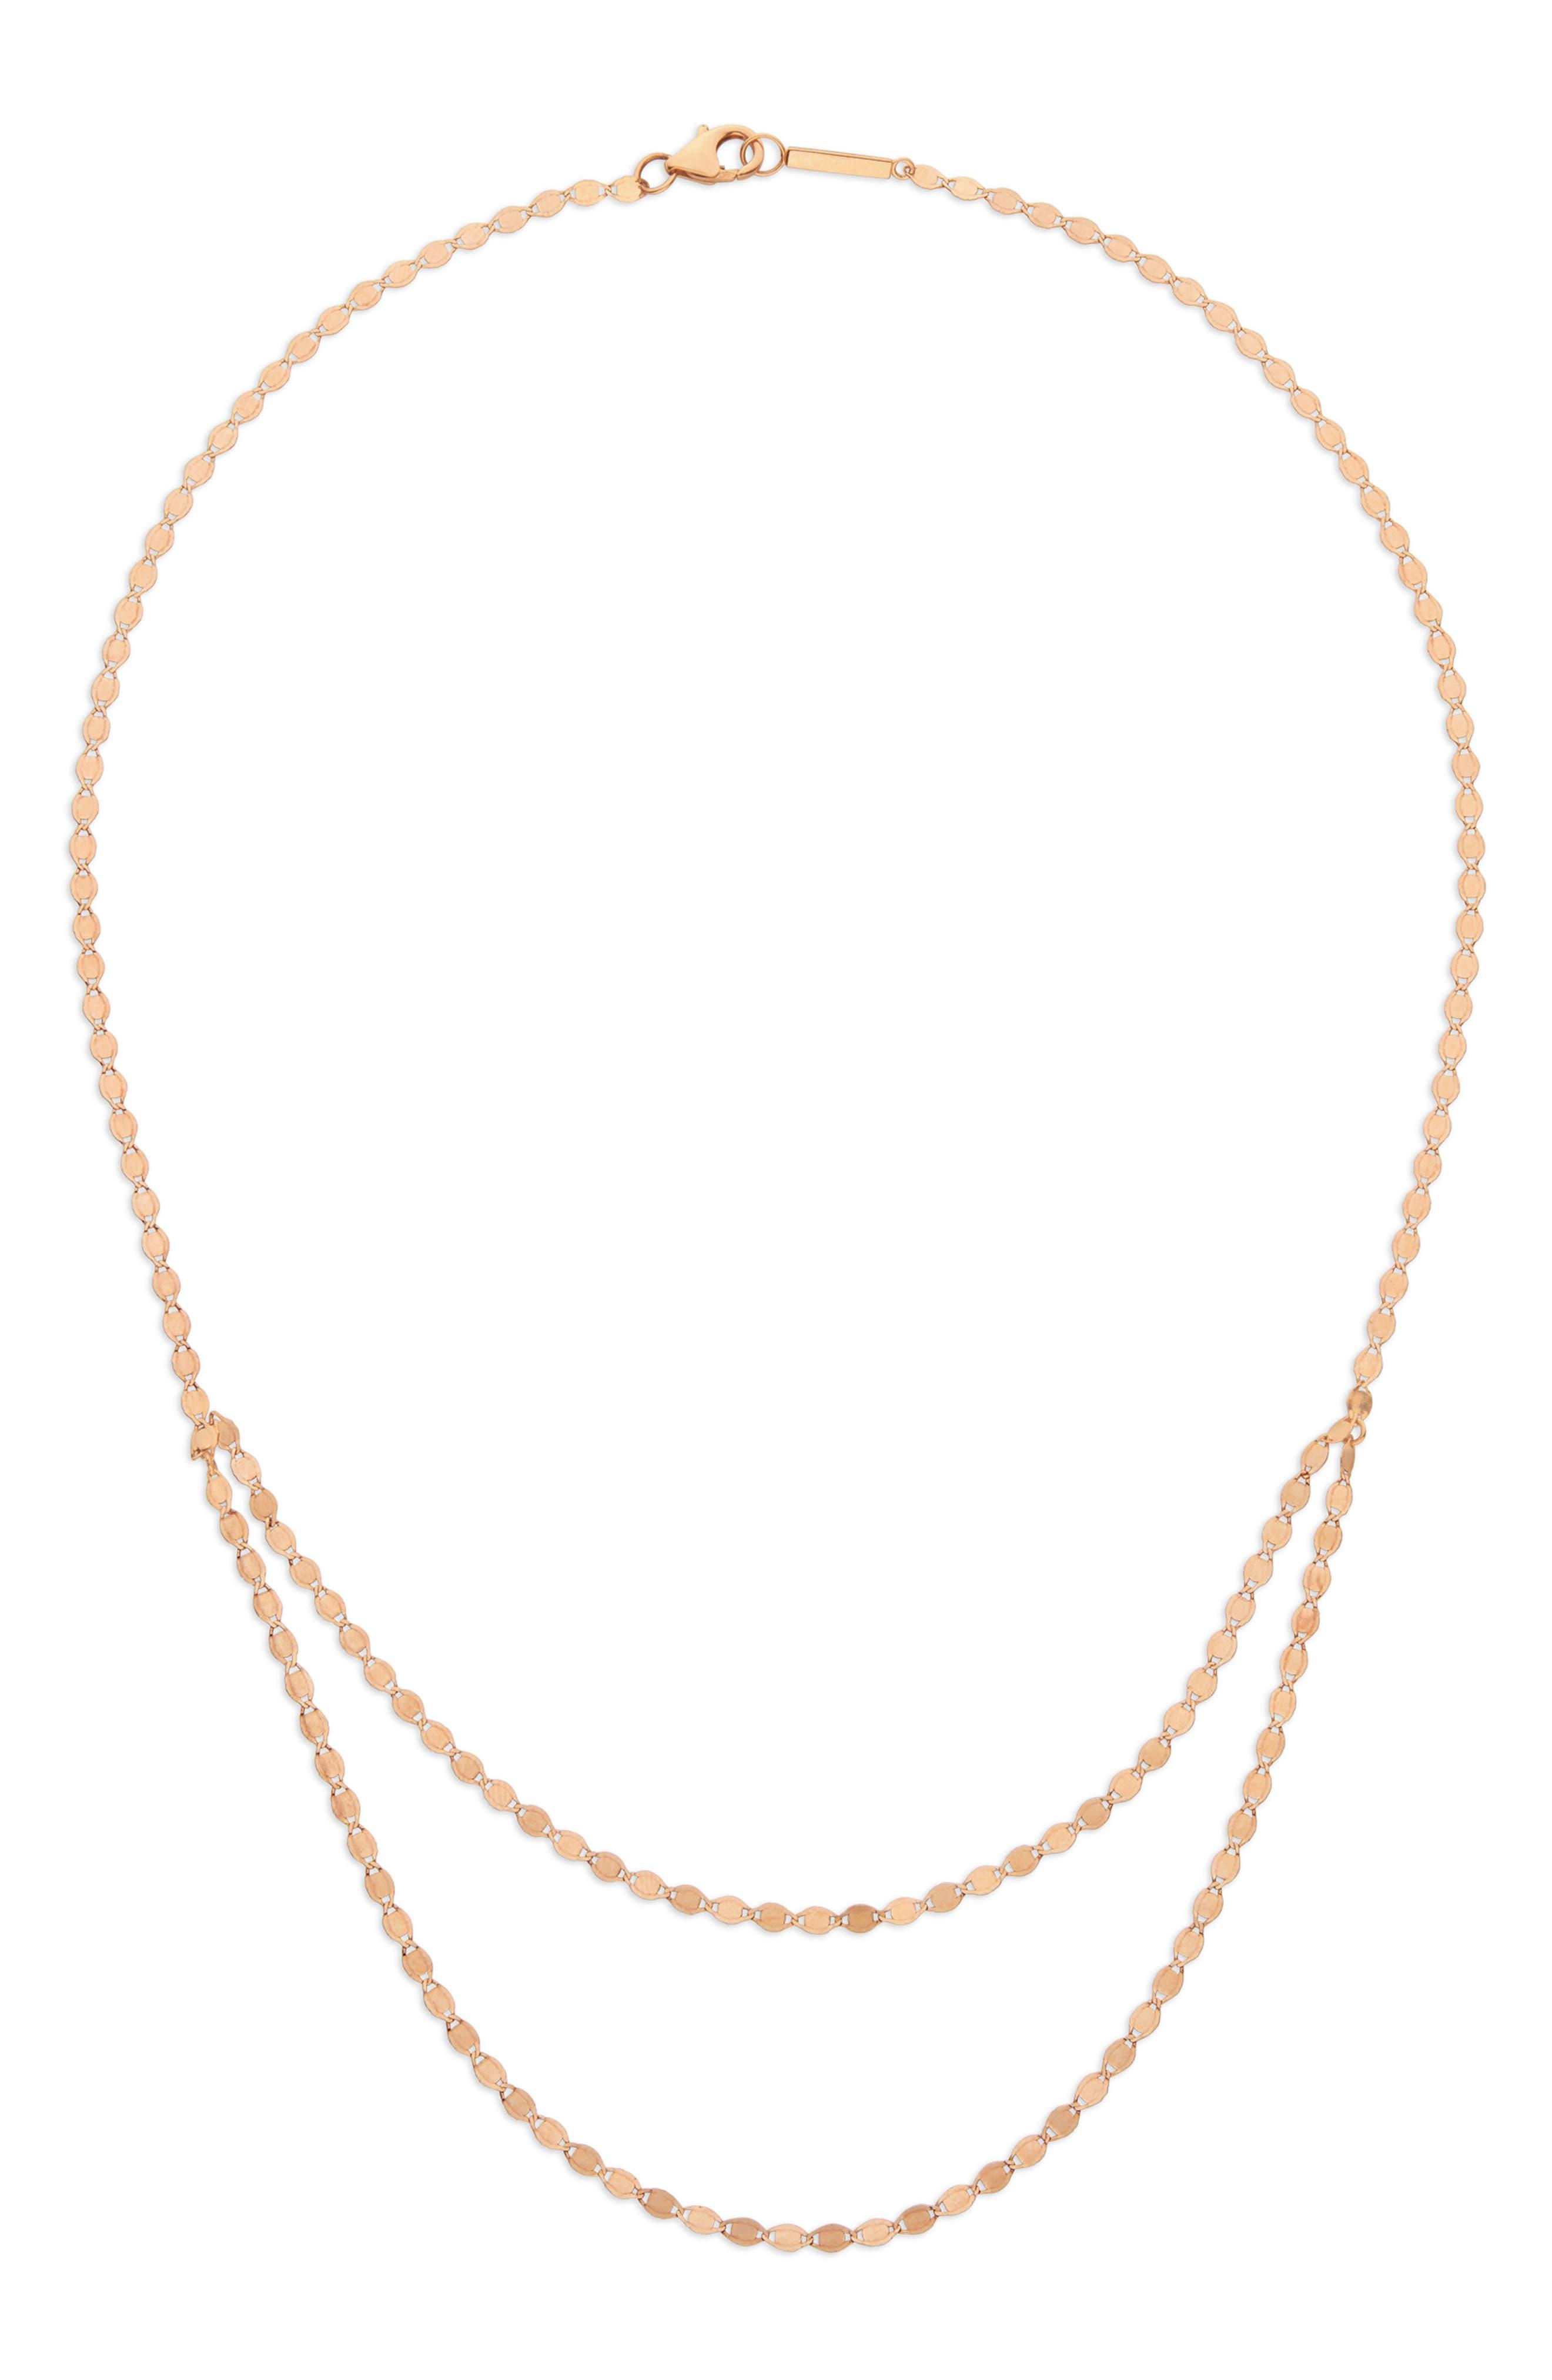 Main Image - Lana Jewelry Blake Double Layer Long Necklace